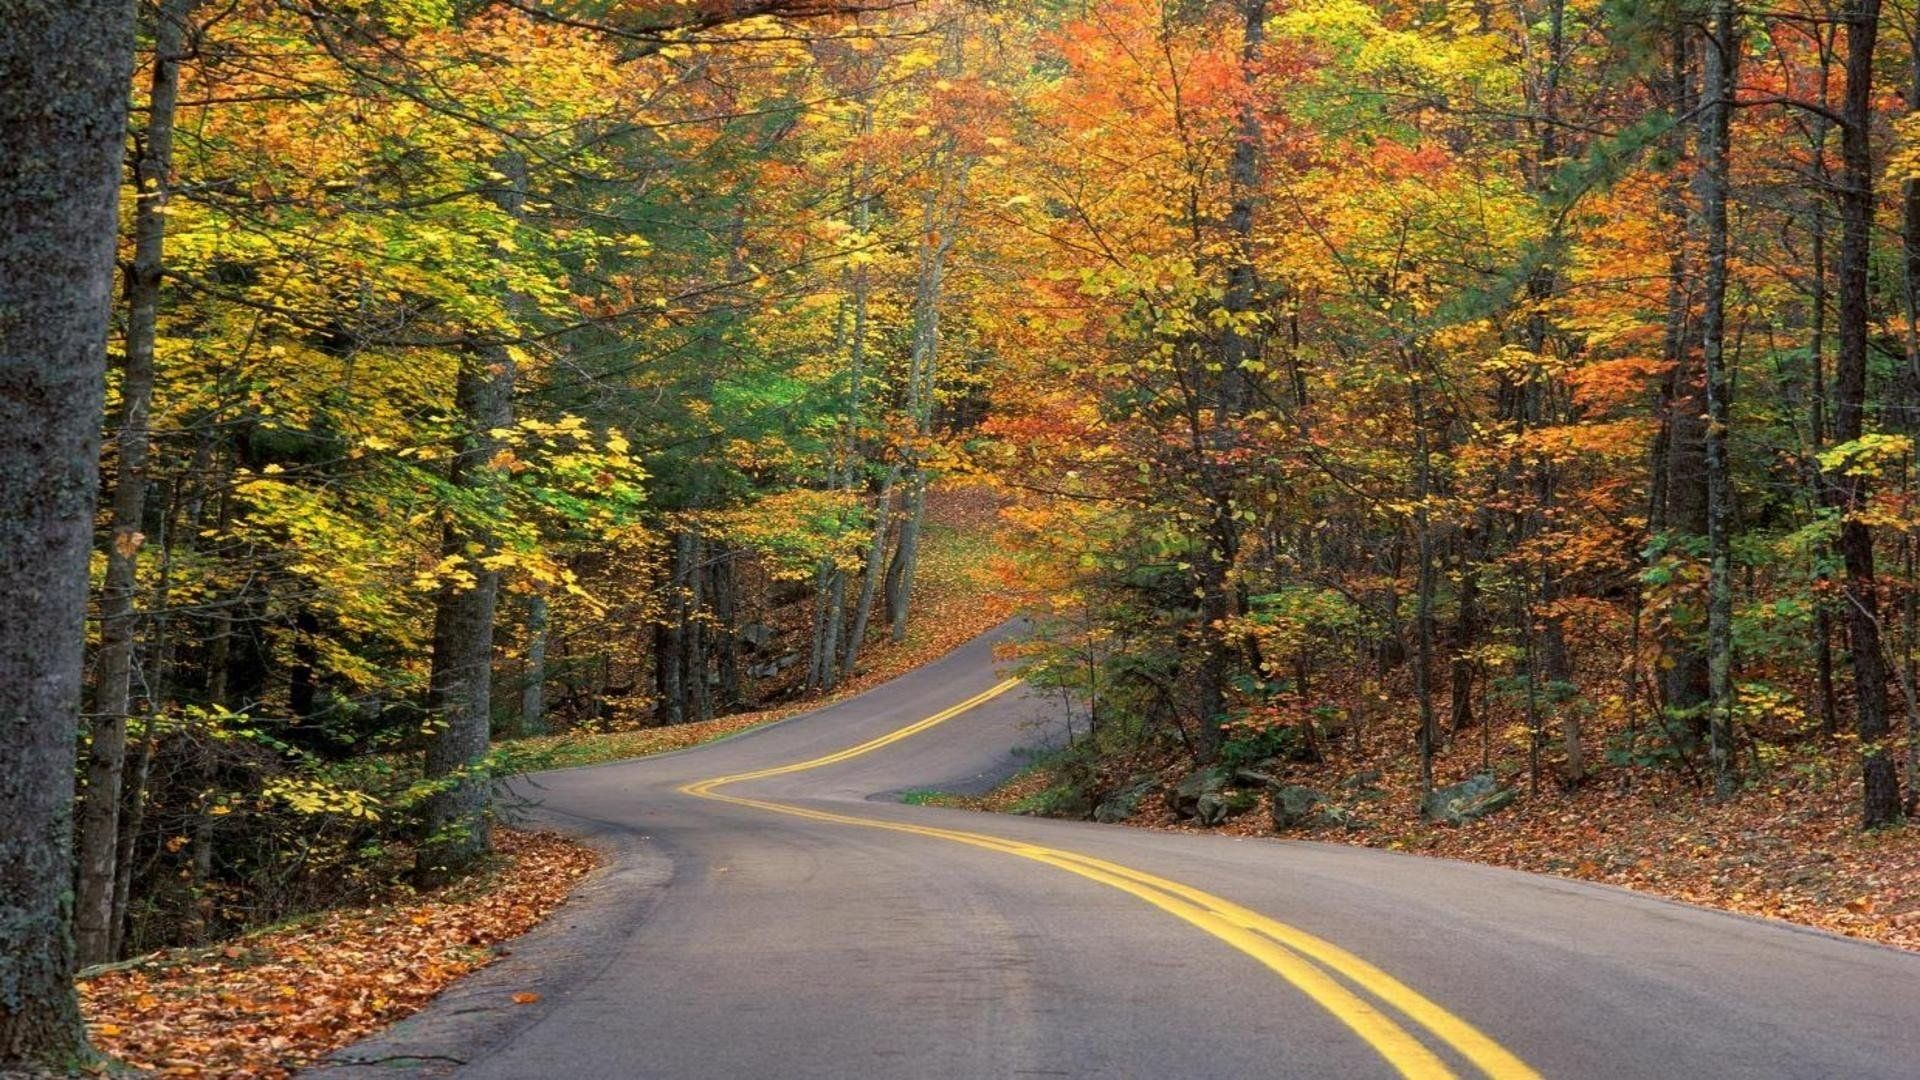 Background Images Of Roads Lastest Beautiful Roads Landscape Fall Wallpaper